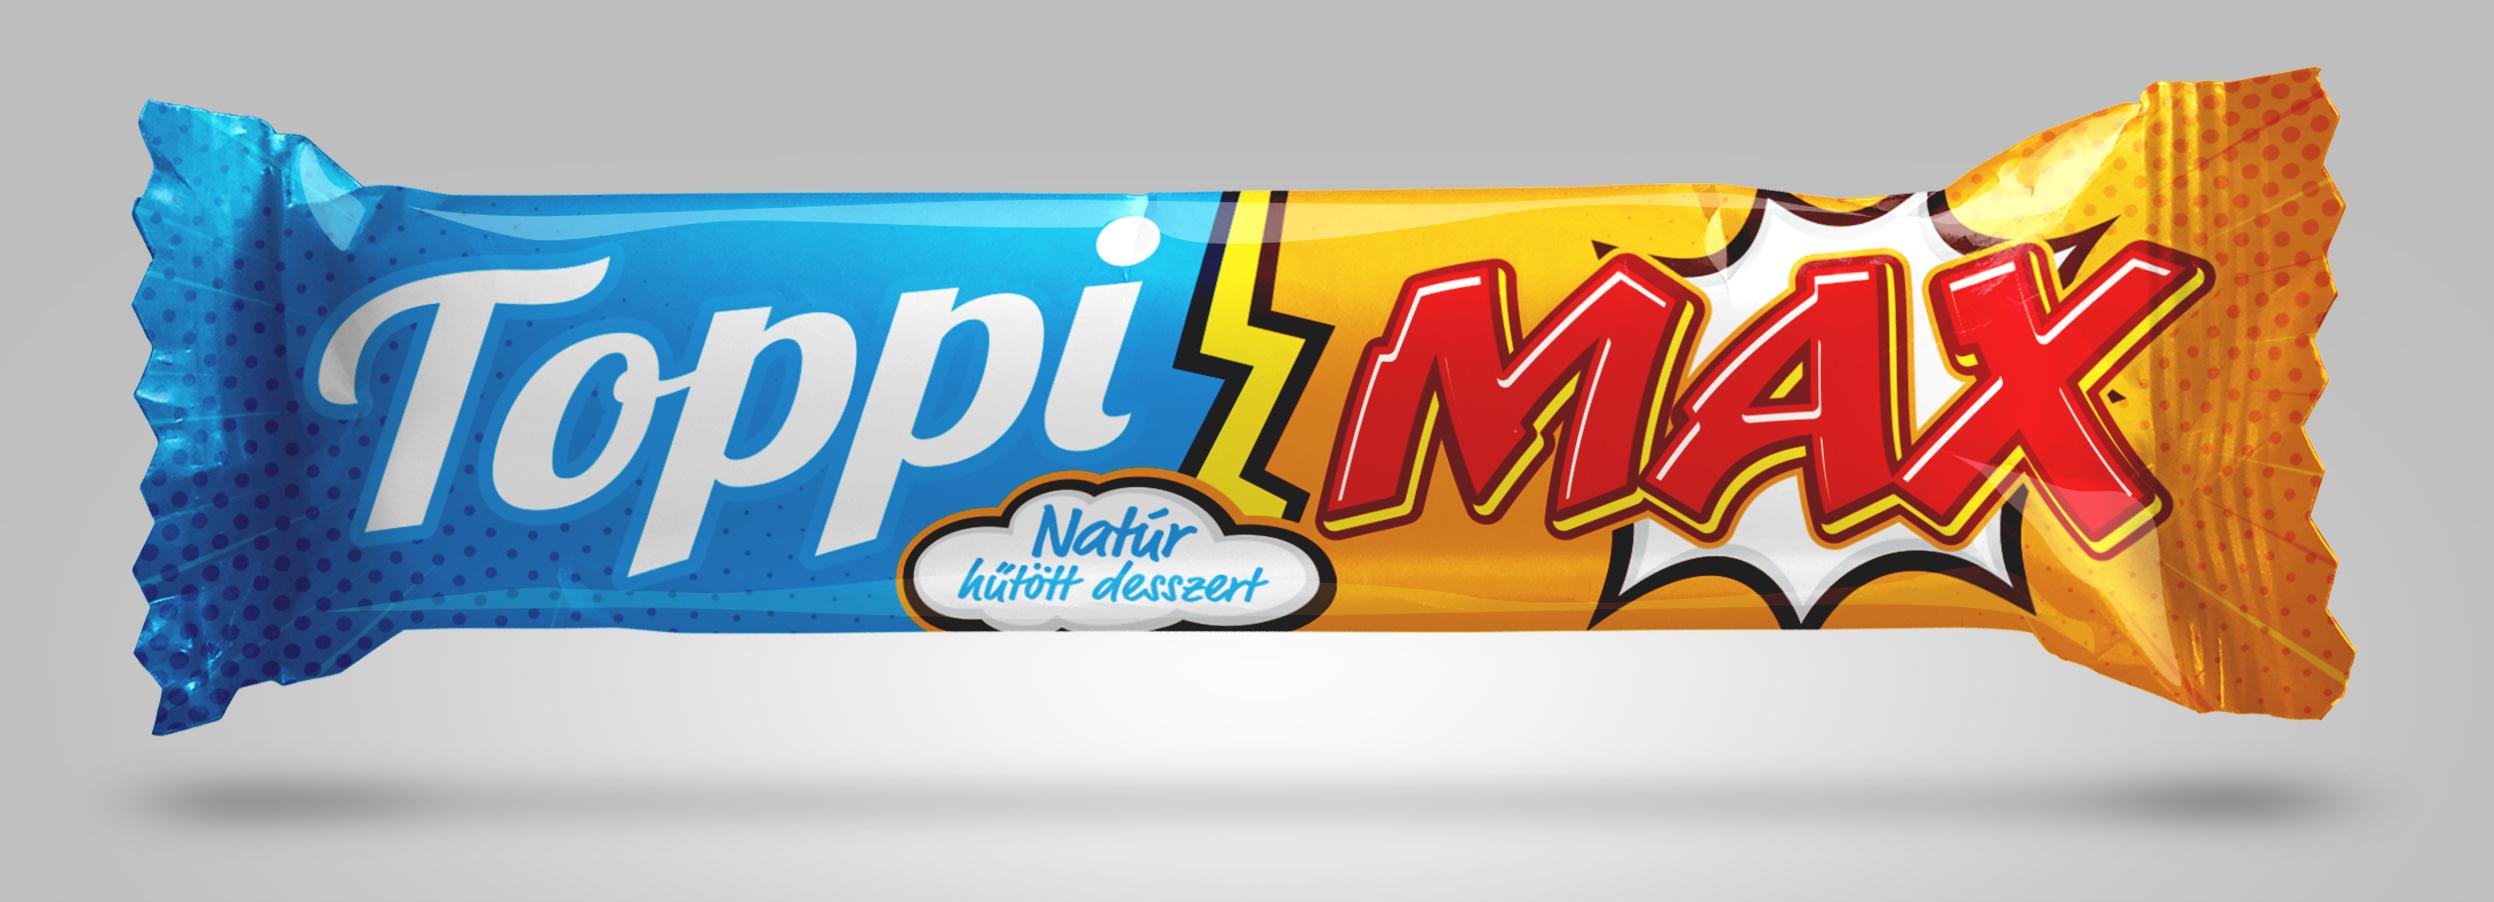 Toppi Max hűtött desszert natúr multipack 5x51g